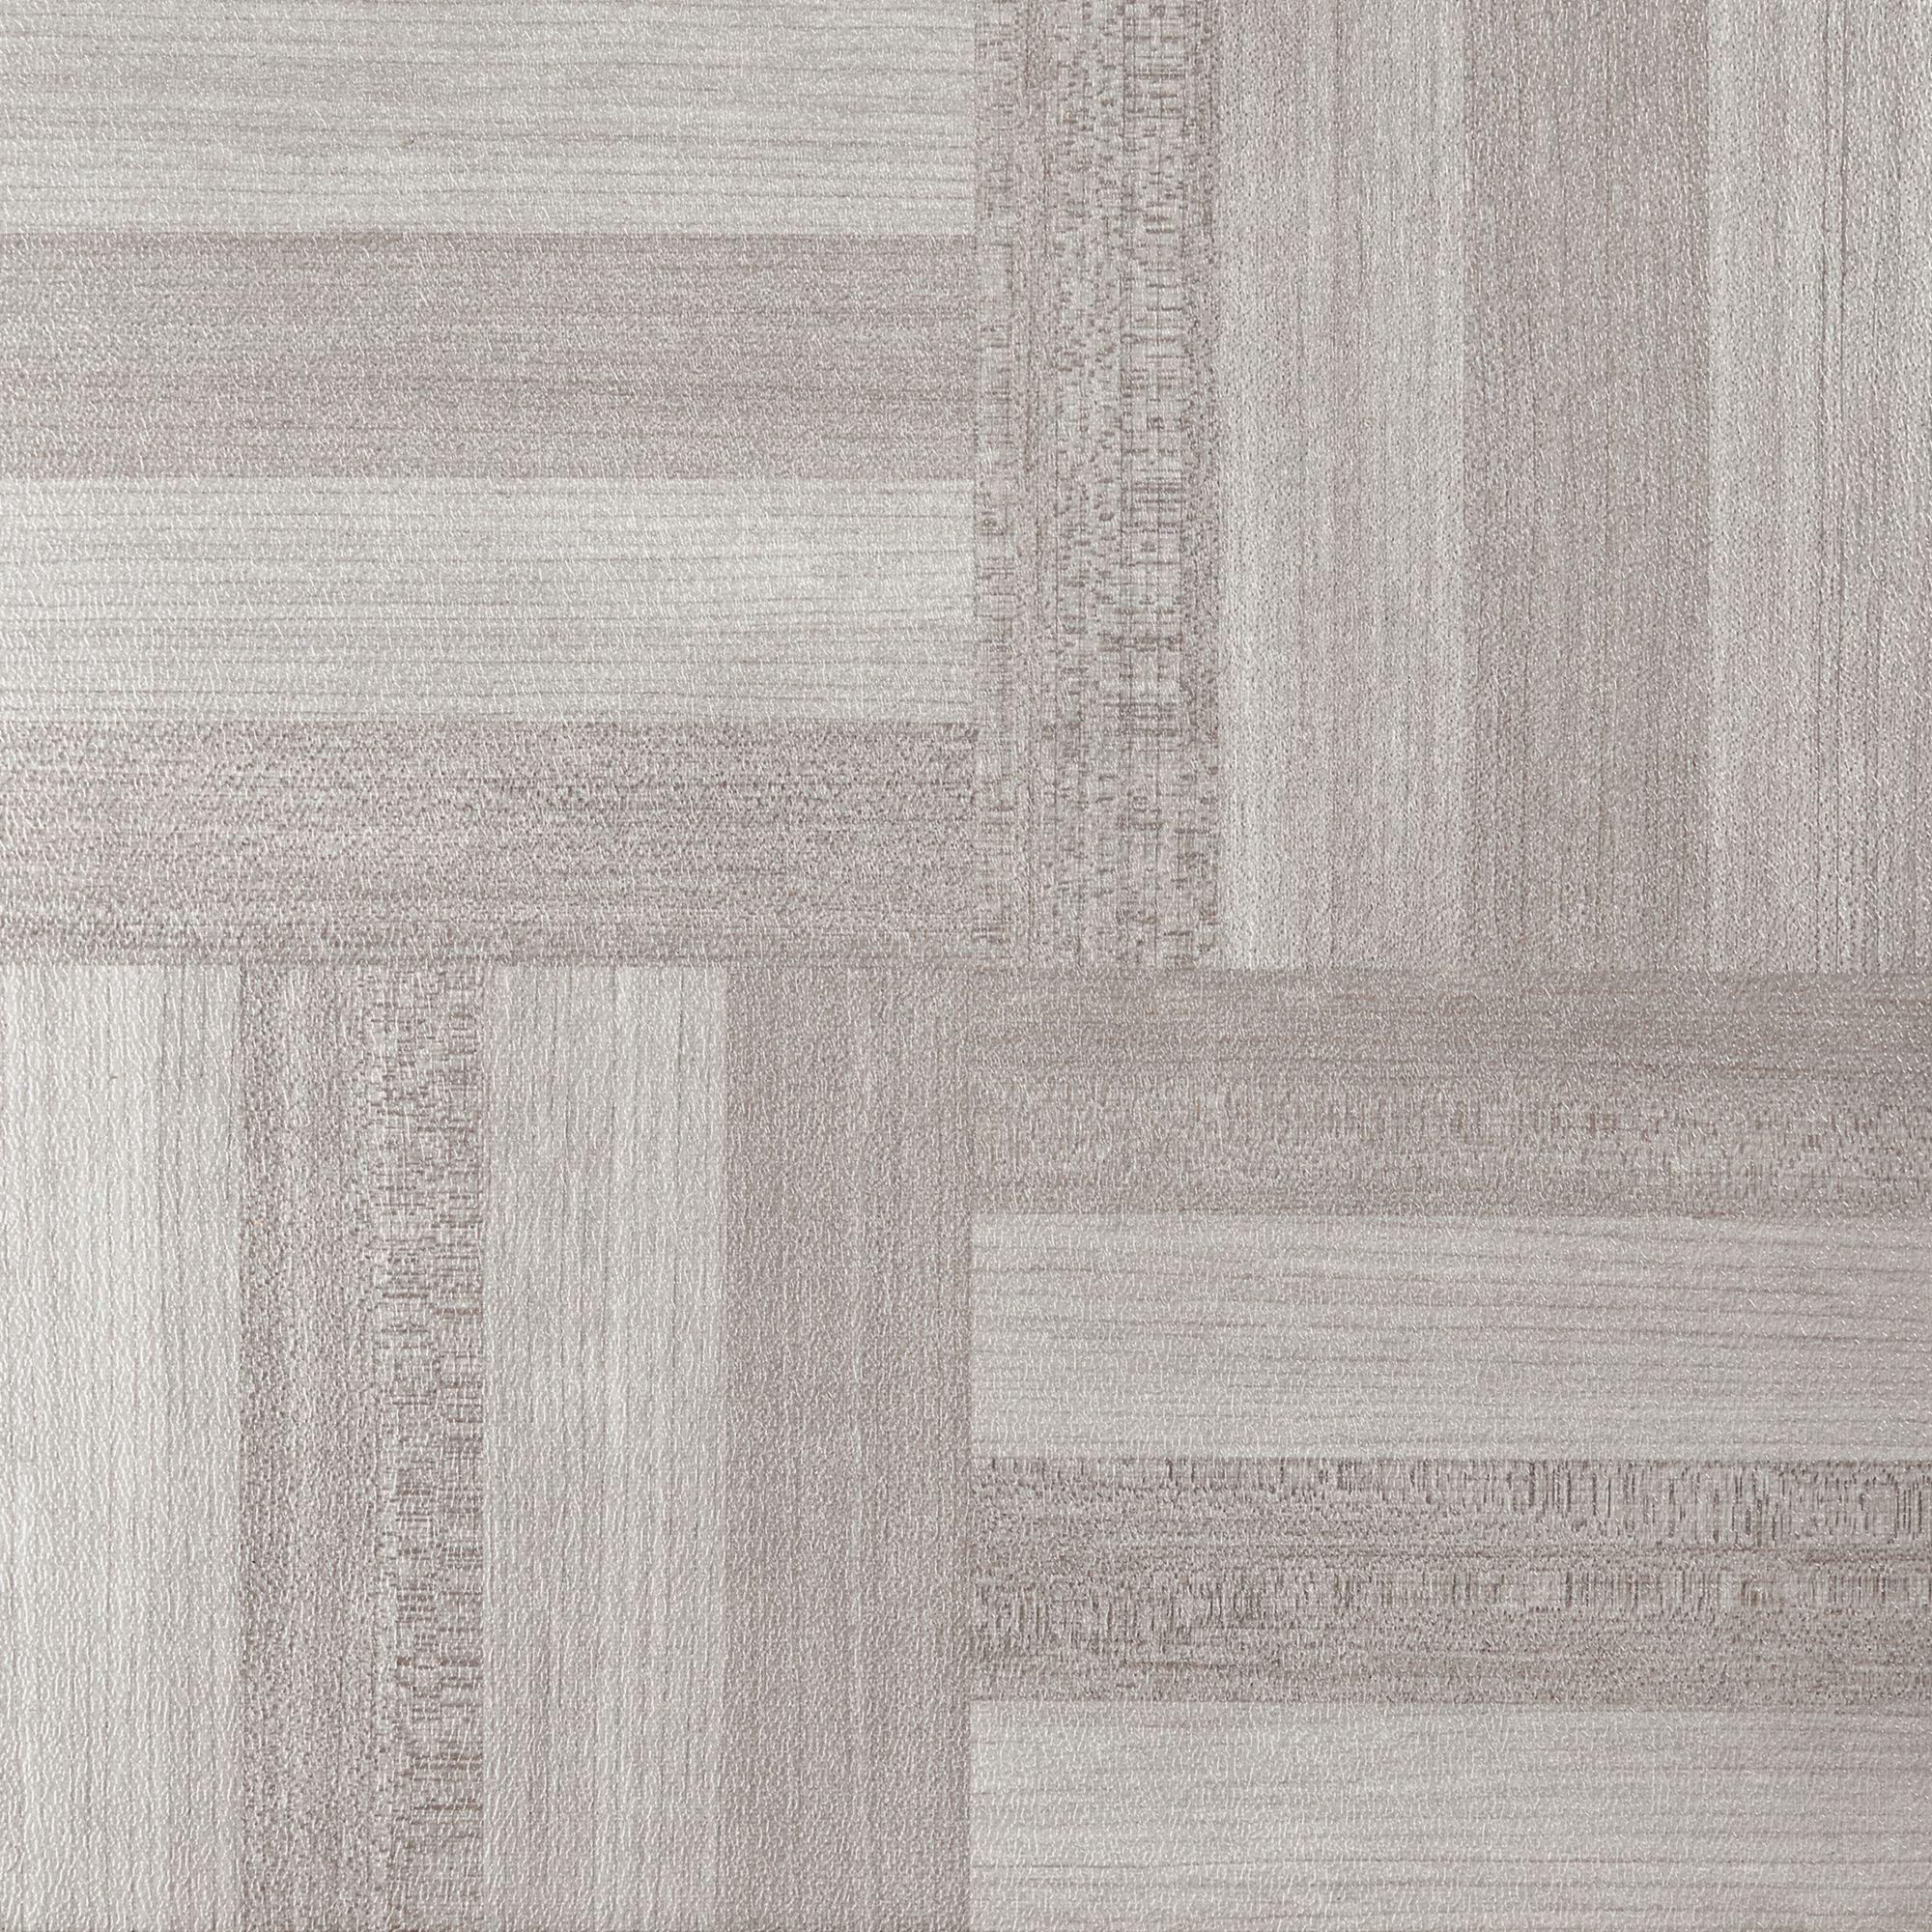 Achim Tivoli Ash Grey Wood 12x12 Self Adhesive Vinyl Floor Tile - 45 Tiles/45 sq. ft.